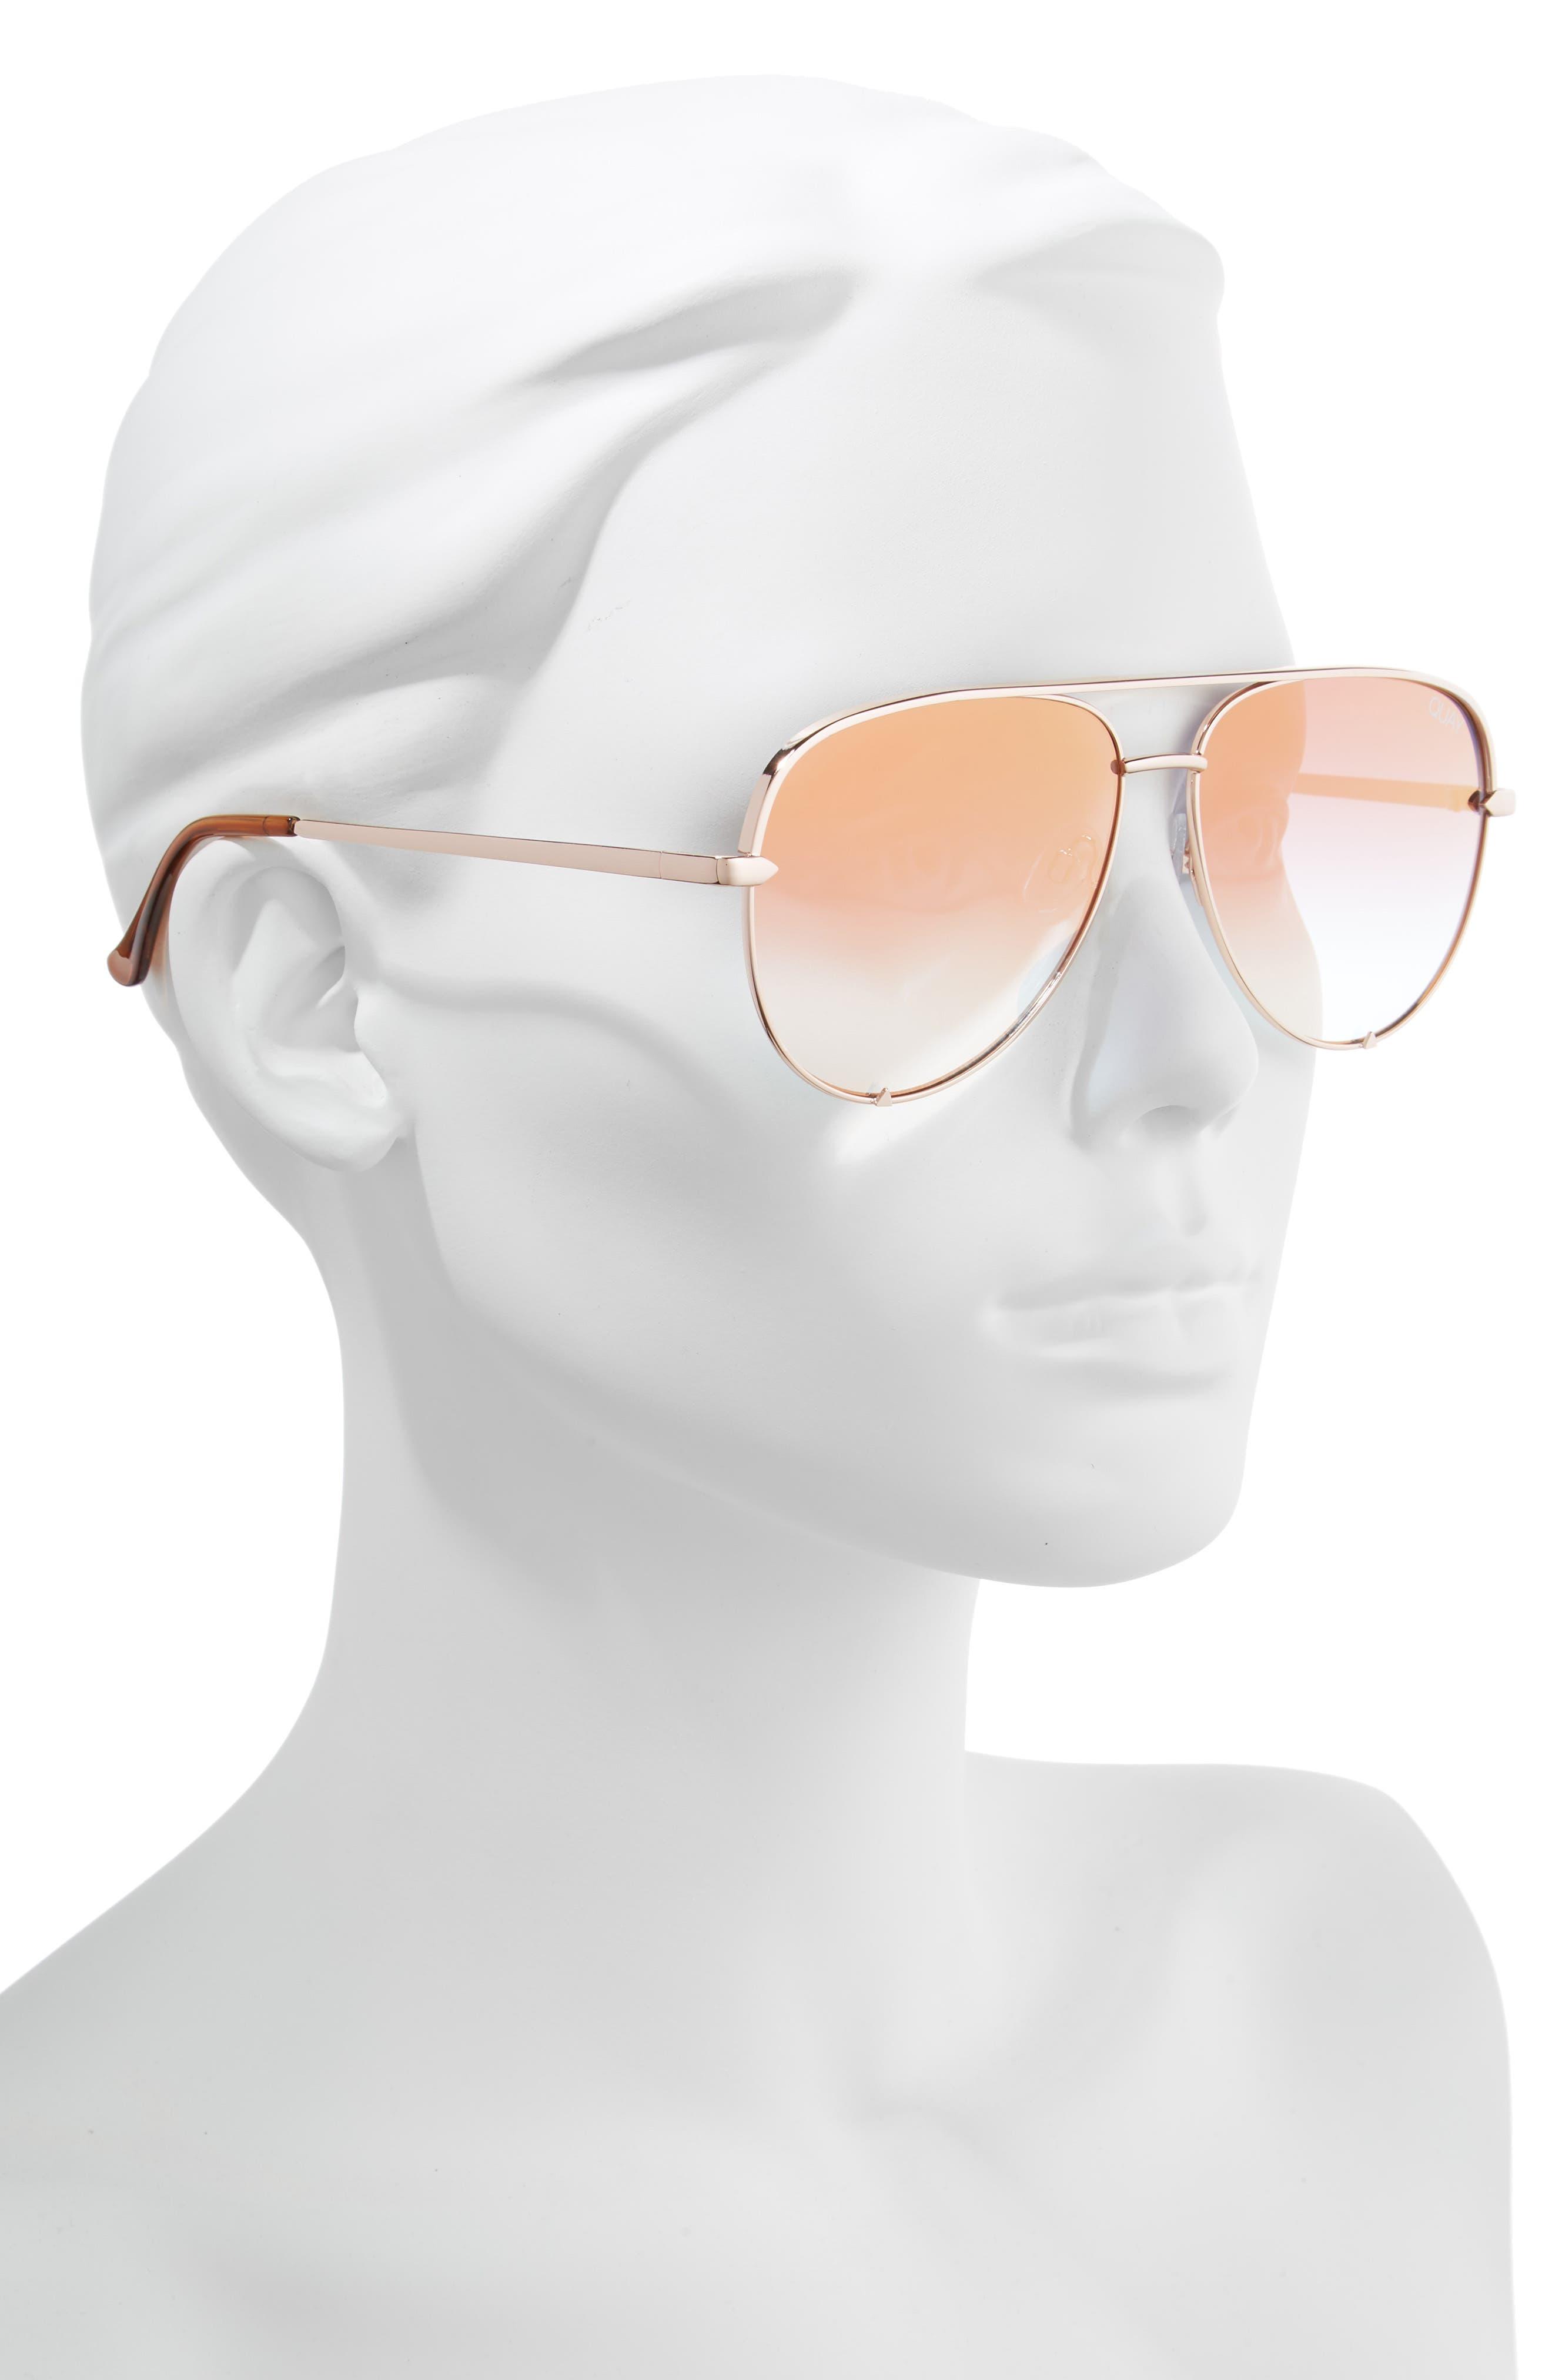 97733704d9d3 Quay Australia Sunglasses for Women